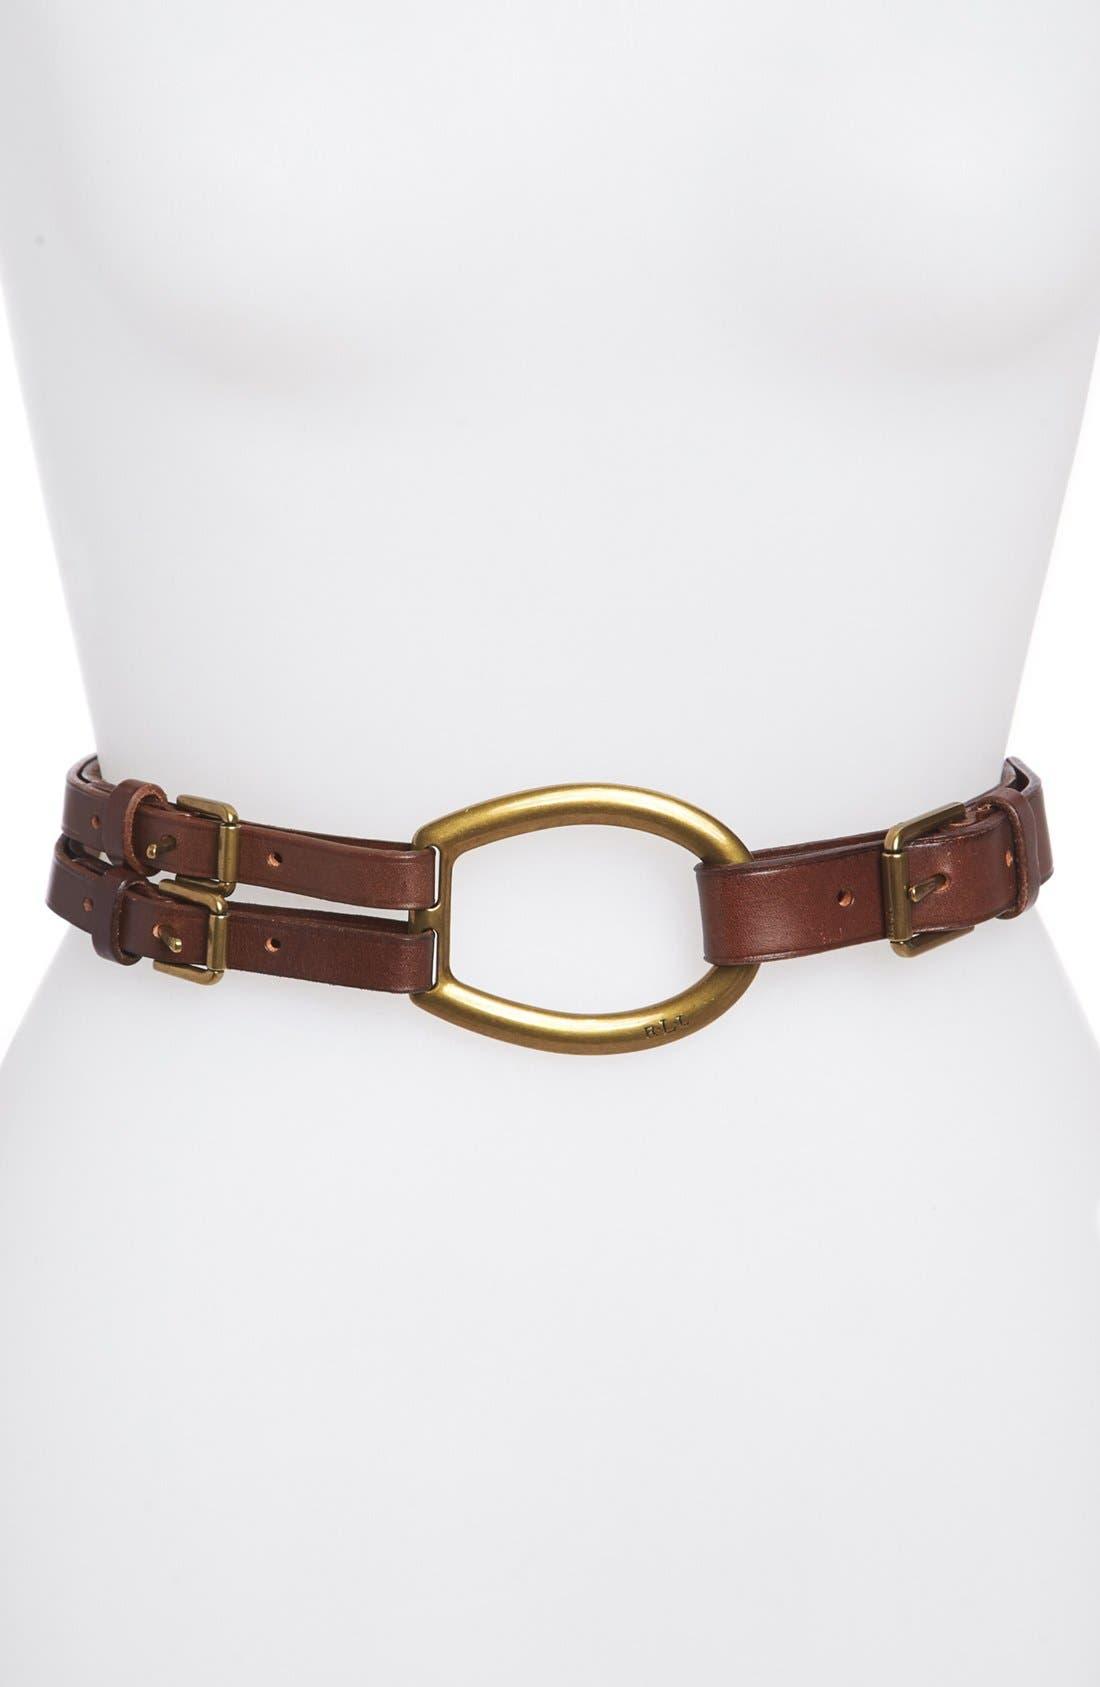 Alternate Image 1 Selected - Lauren Ralph Lauren Tri-Strap Belt